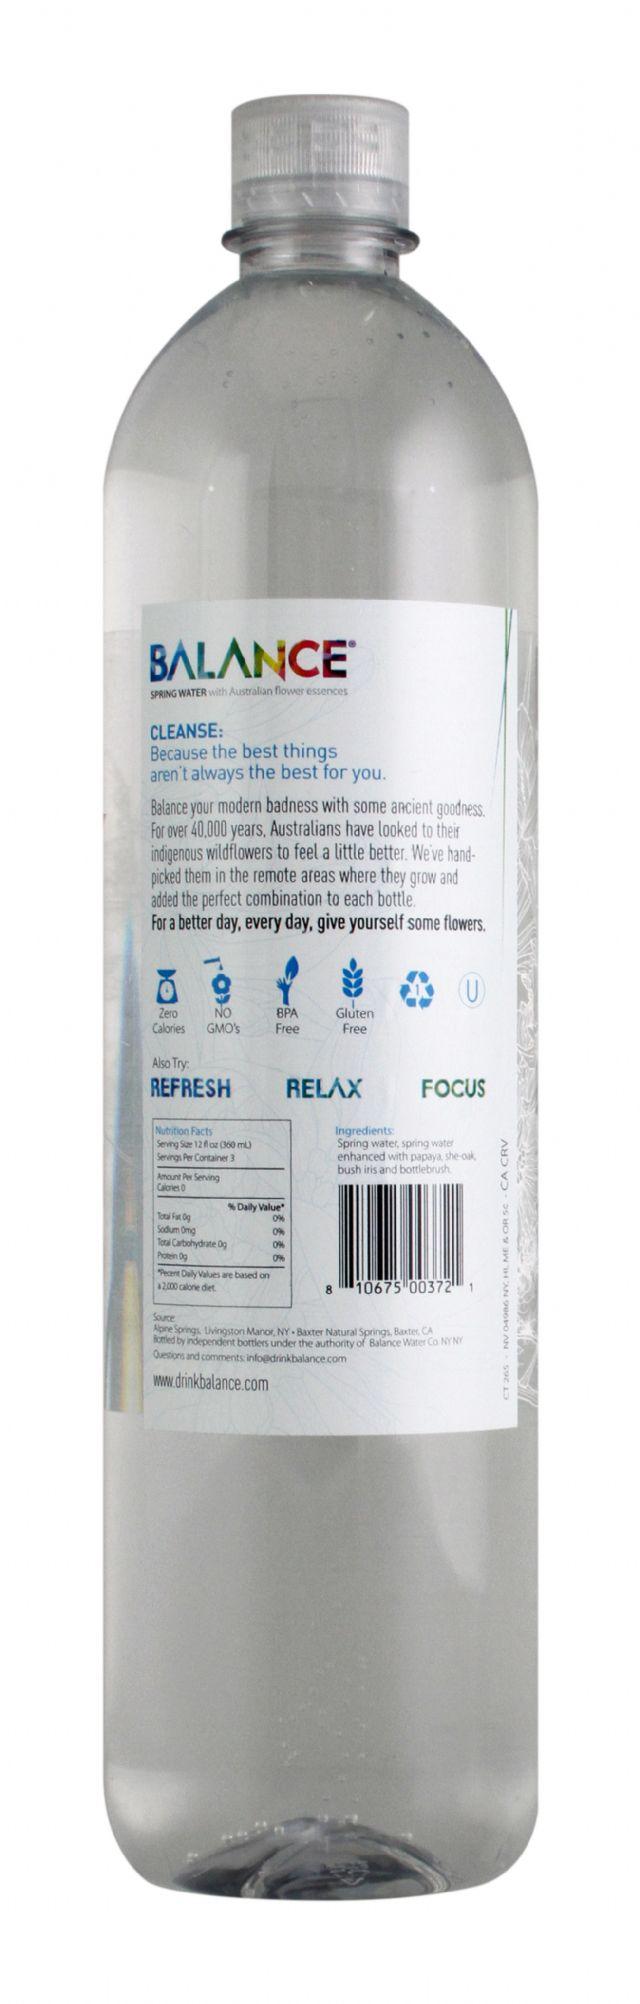 Balance Water: Balance Cleanse Facts